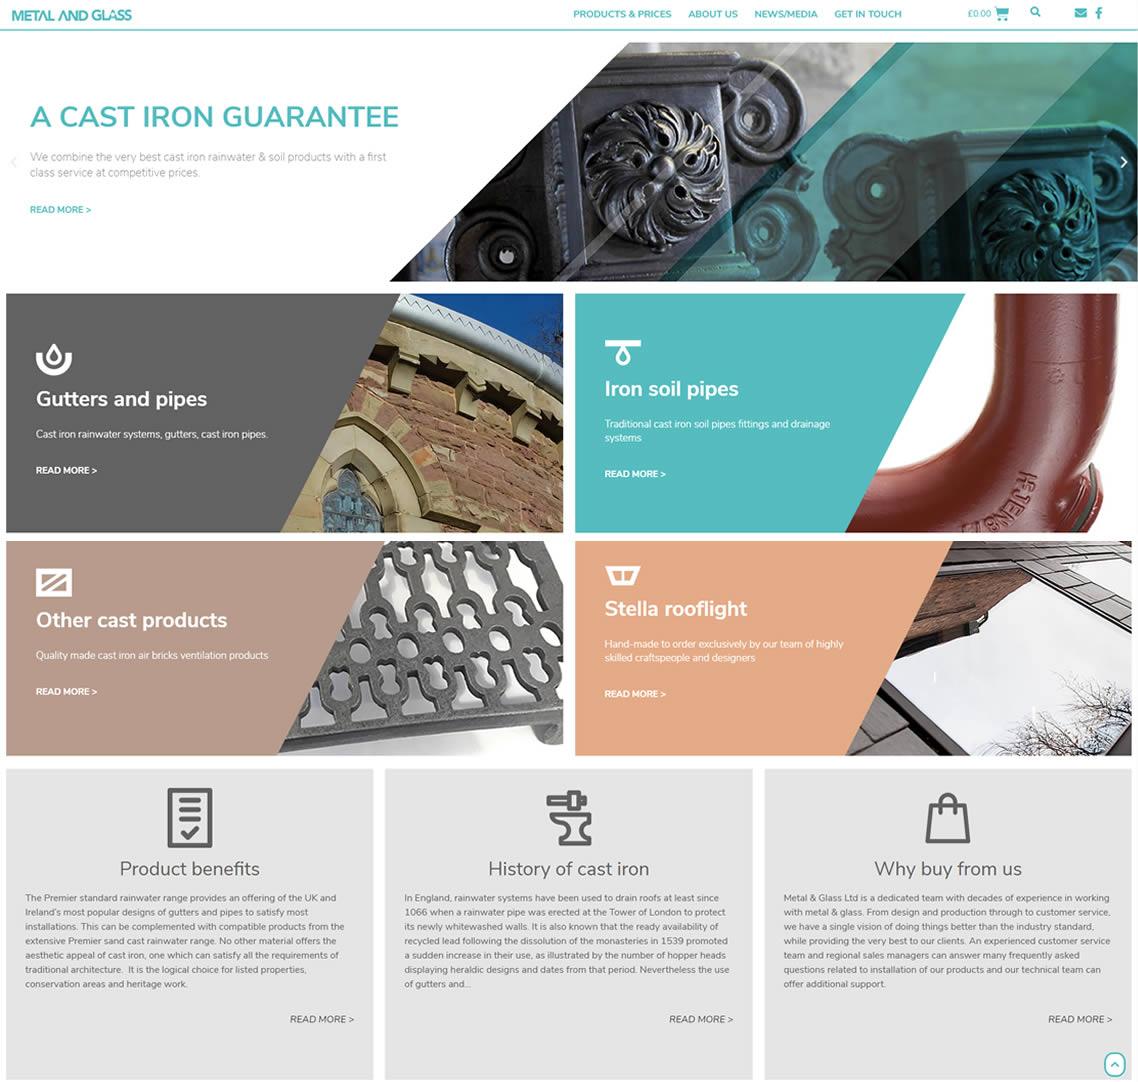 Metal and Glass Website Design